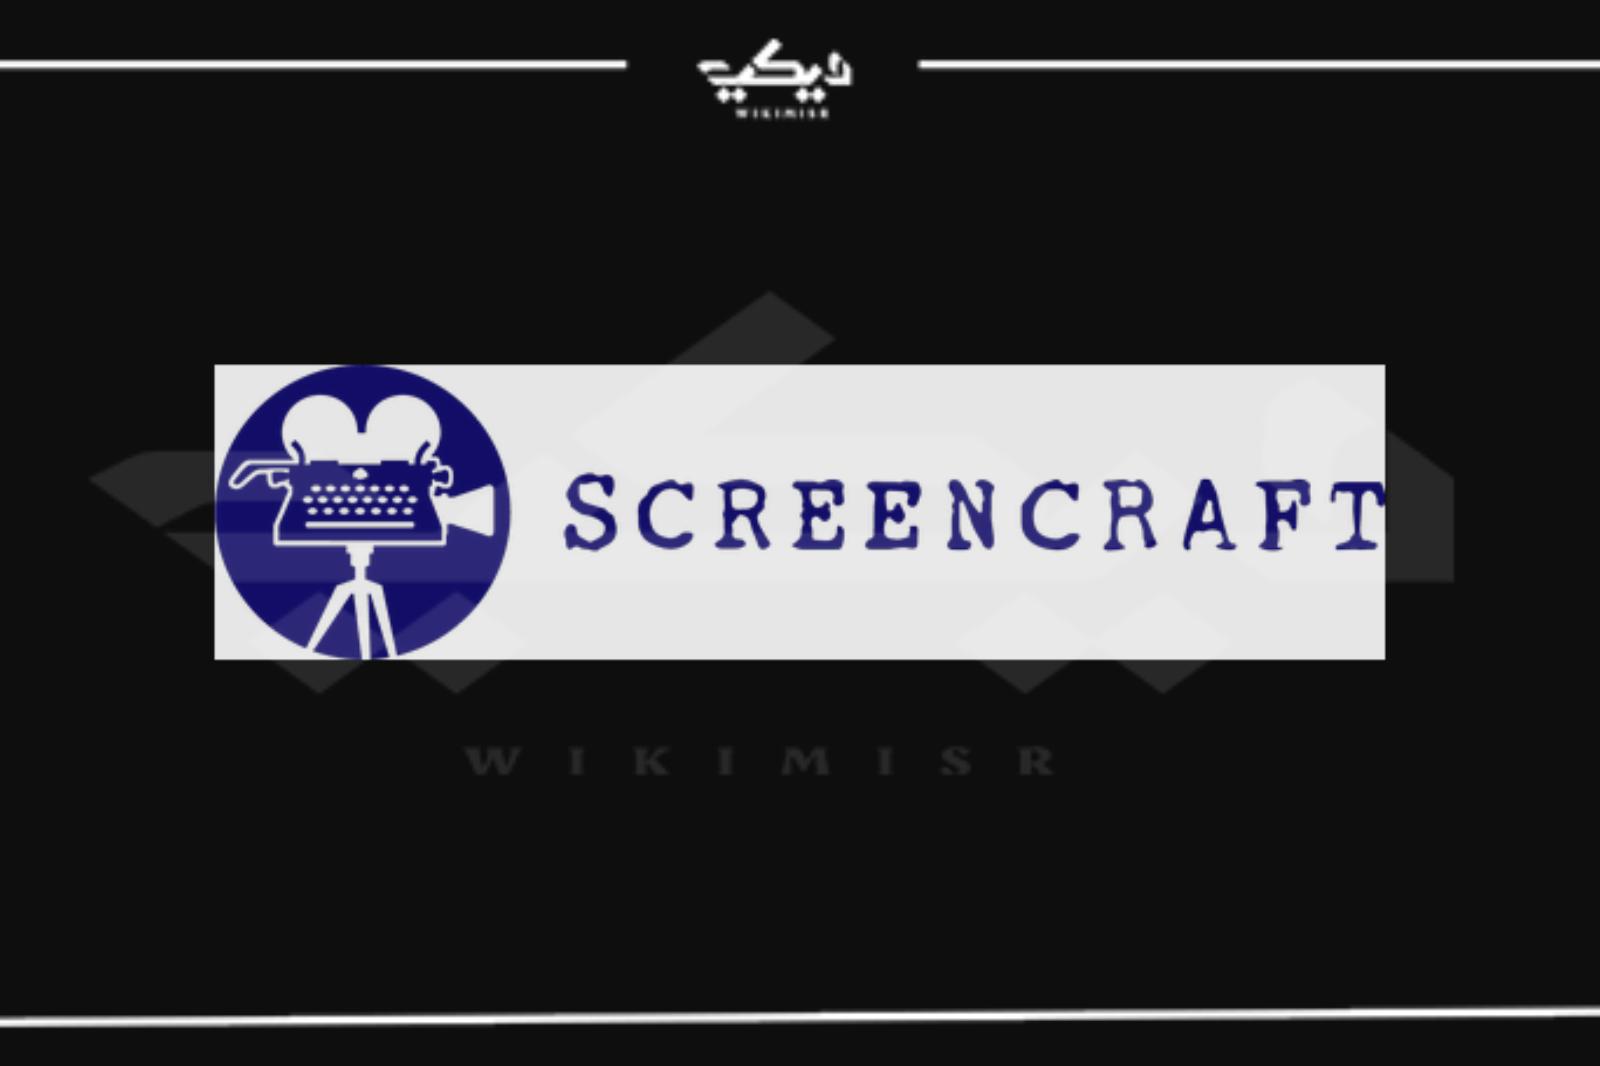 screen craft